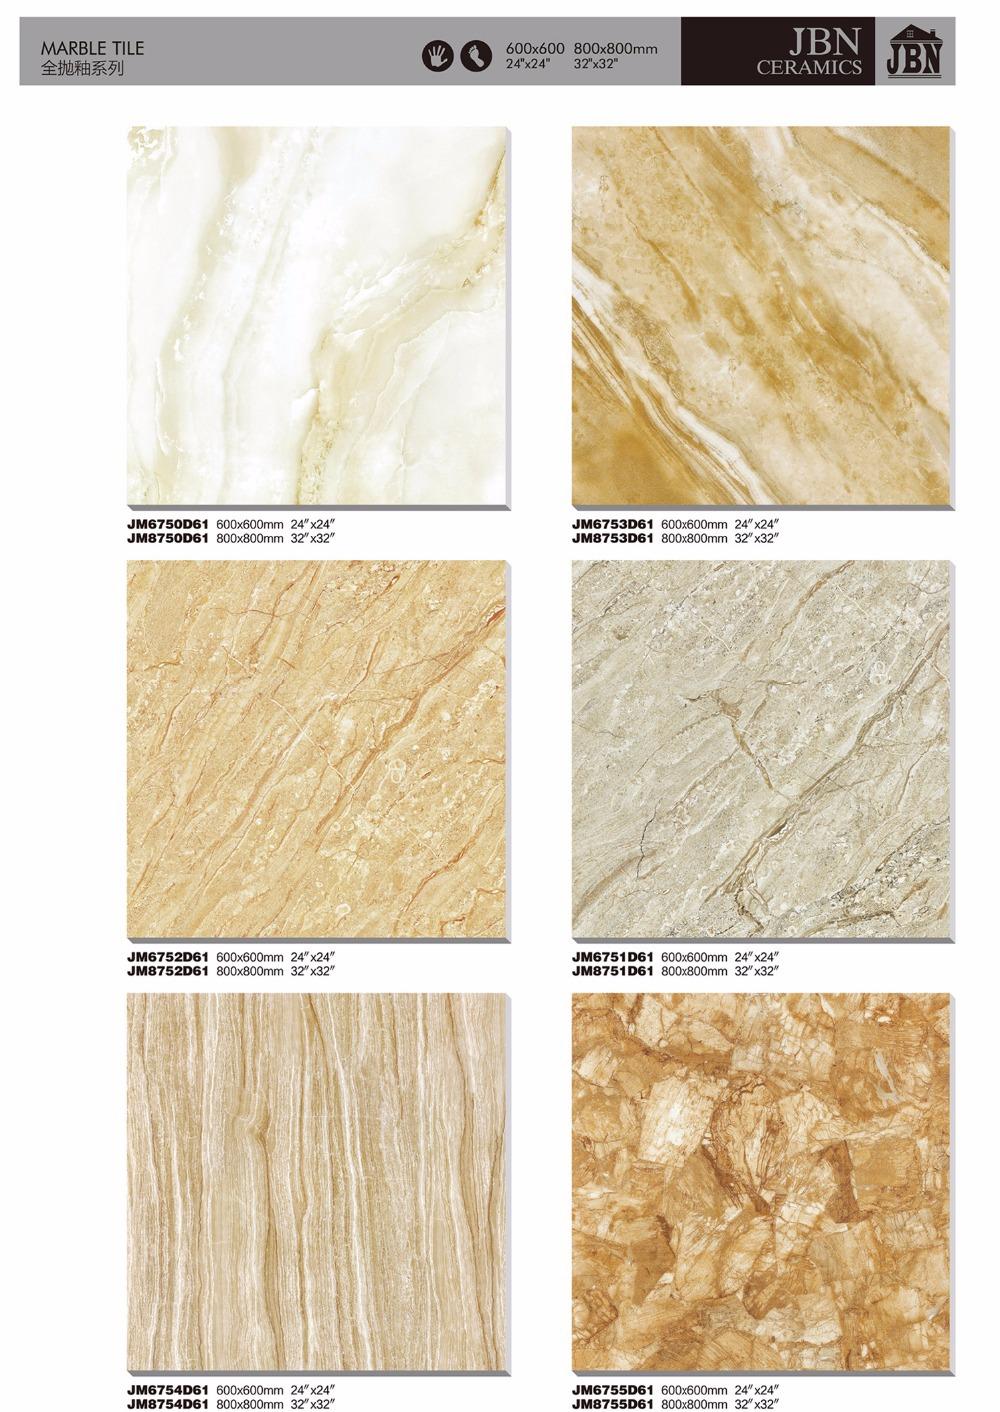 Epoxy floor tiles ceramic tile marble tiles price in india epoxy floor tiles ceramic tile marble tiles price in india polished faux marble tile marble look dailygadgetfo Gallery